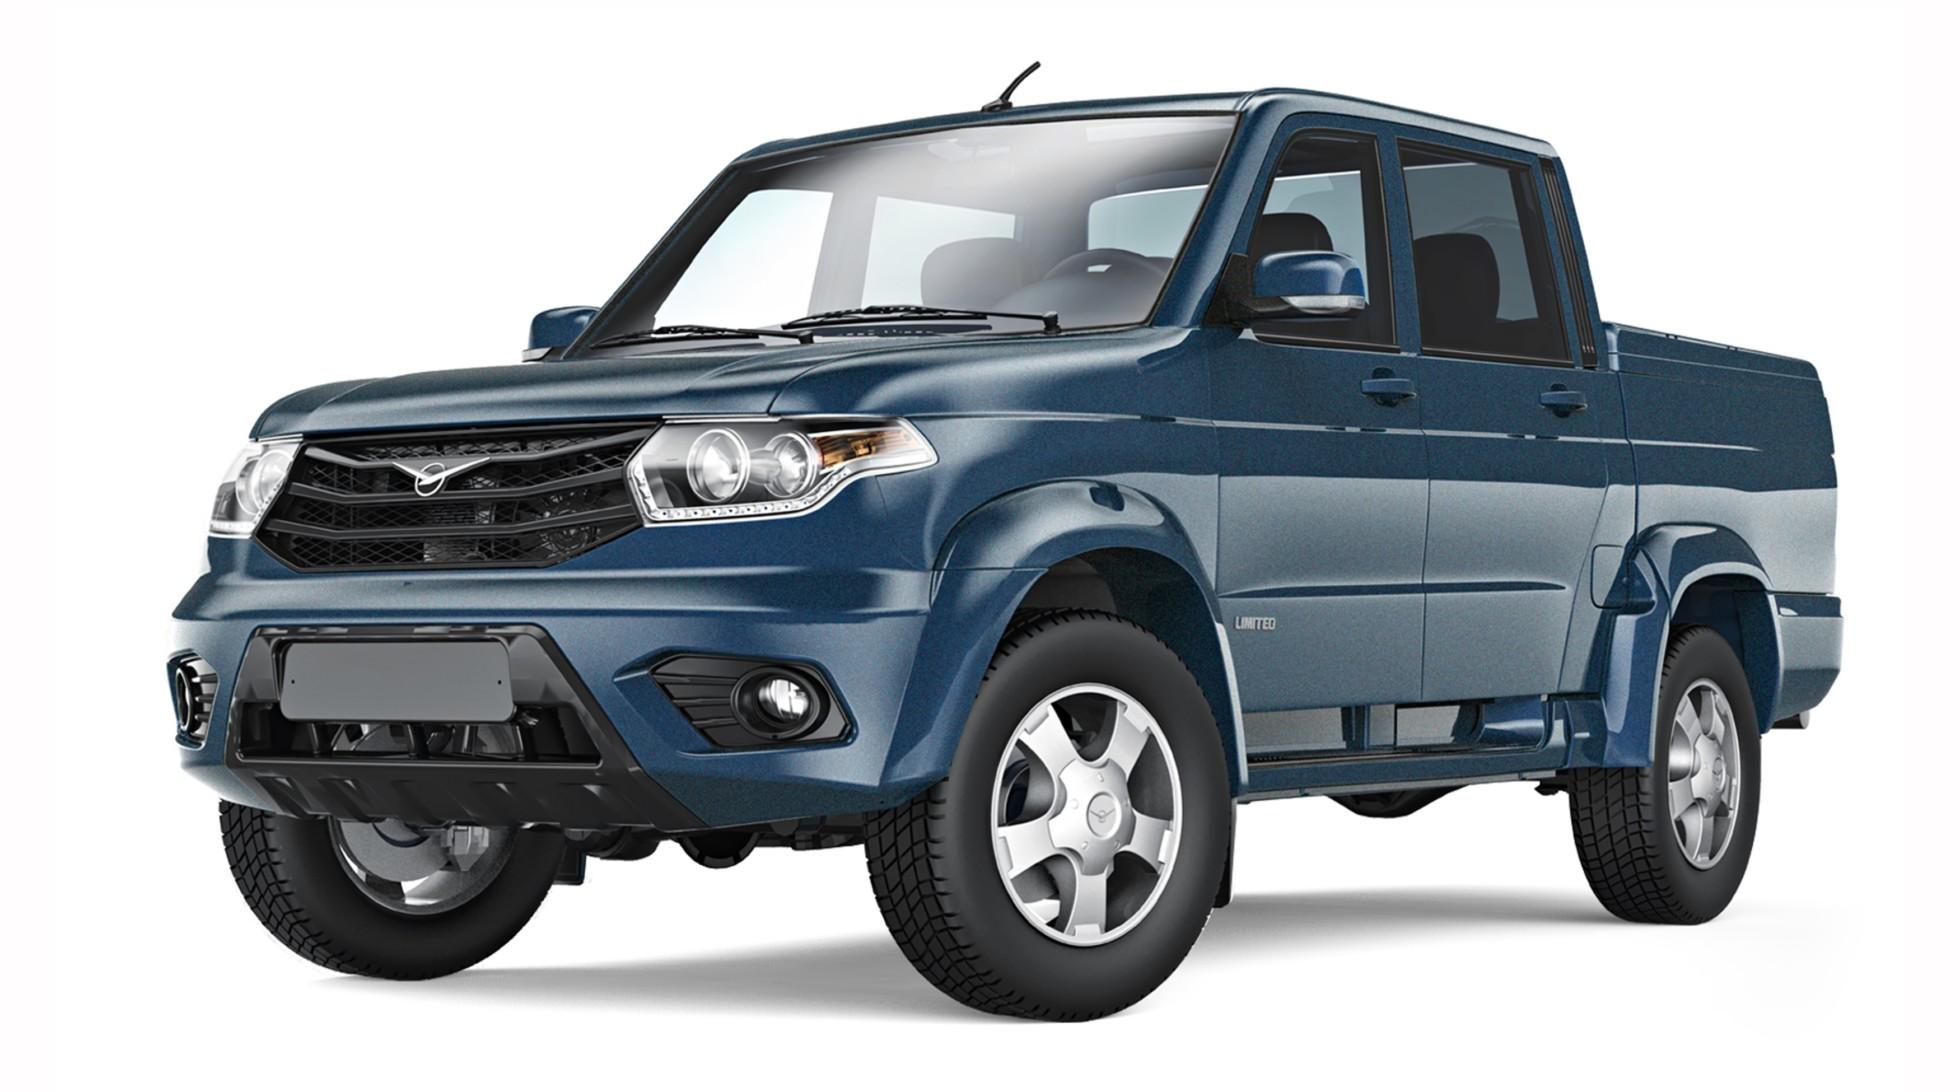 УАЗ Pickup лидер сектора на русском рынке